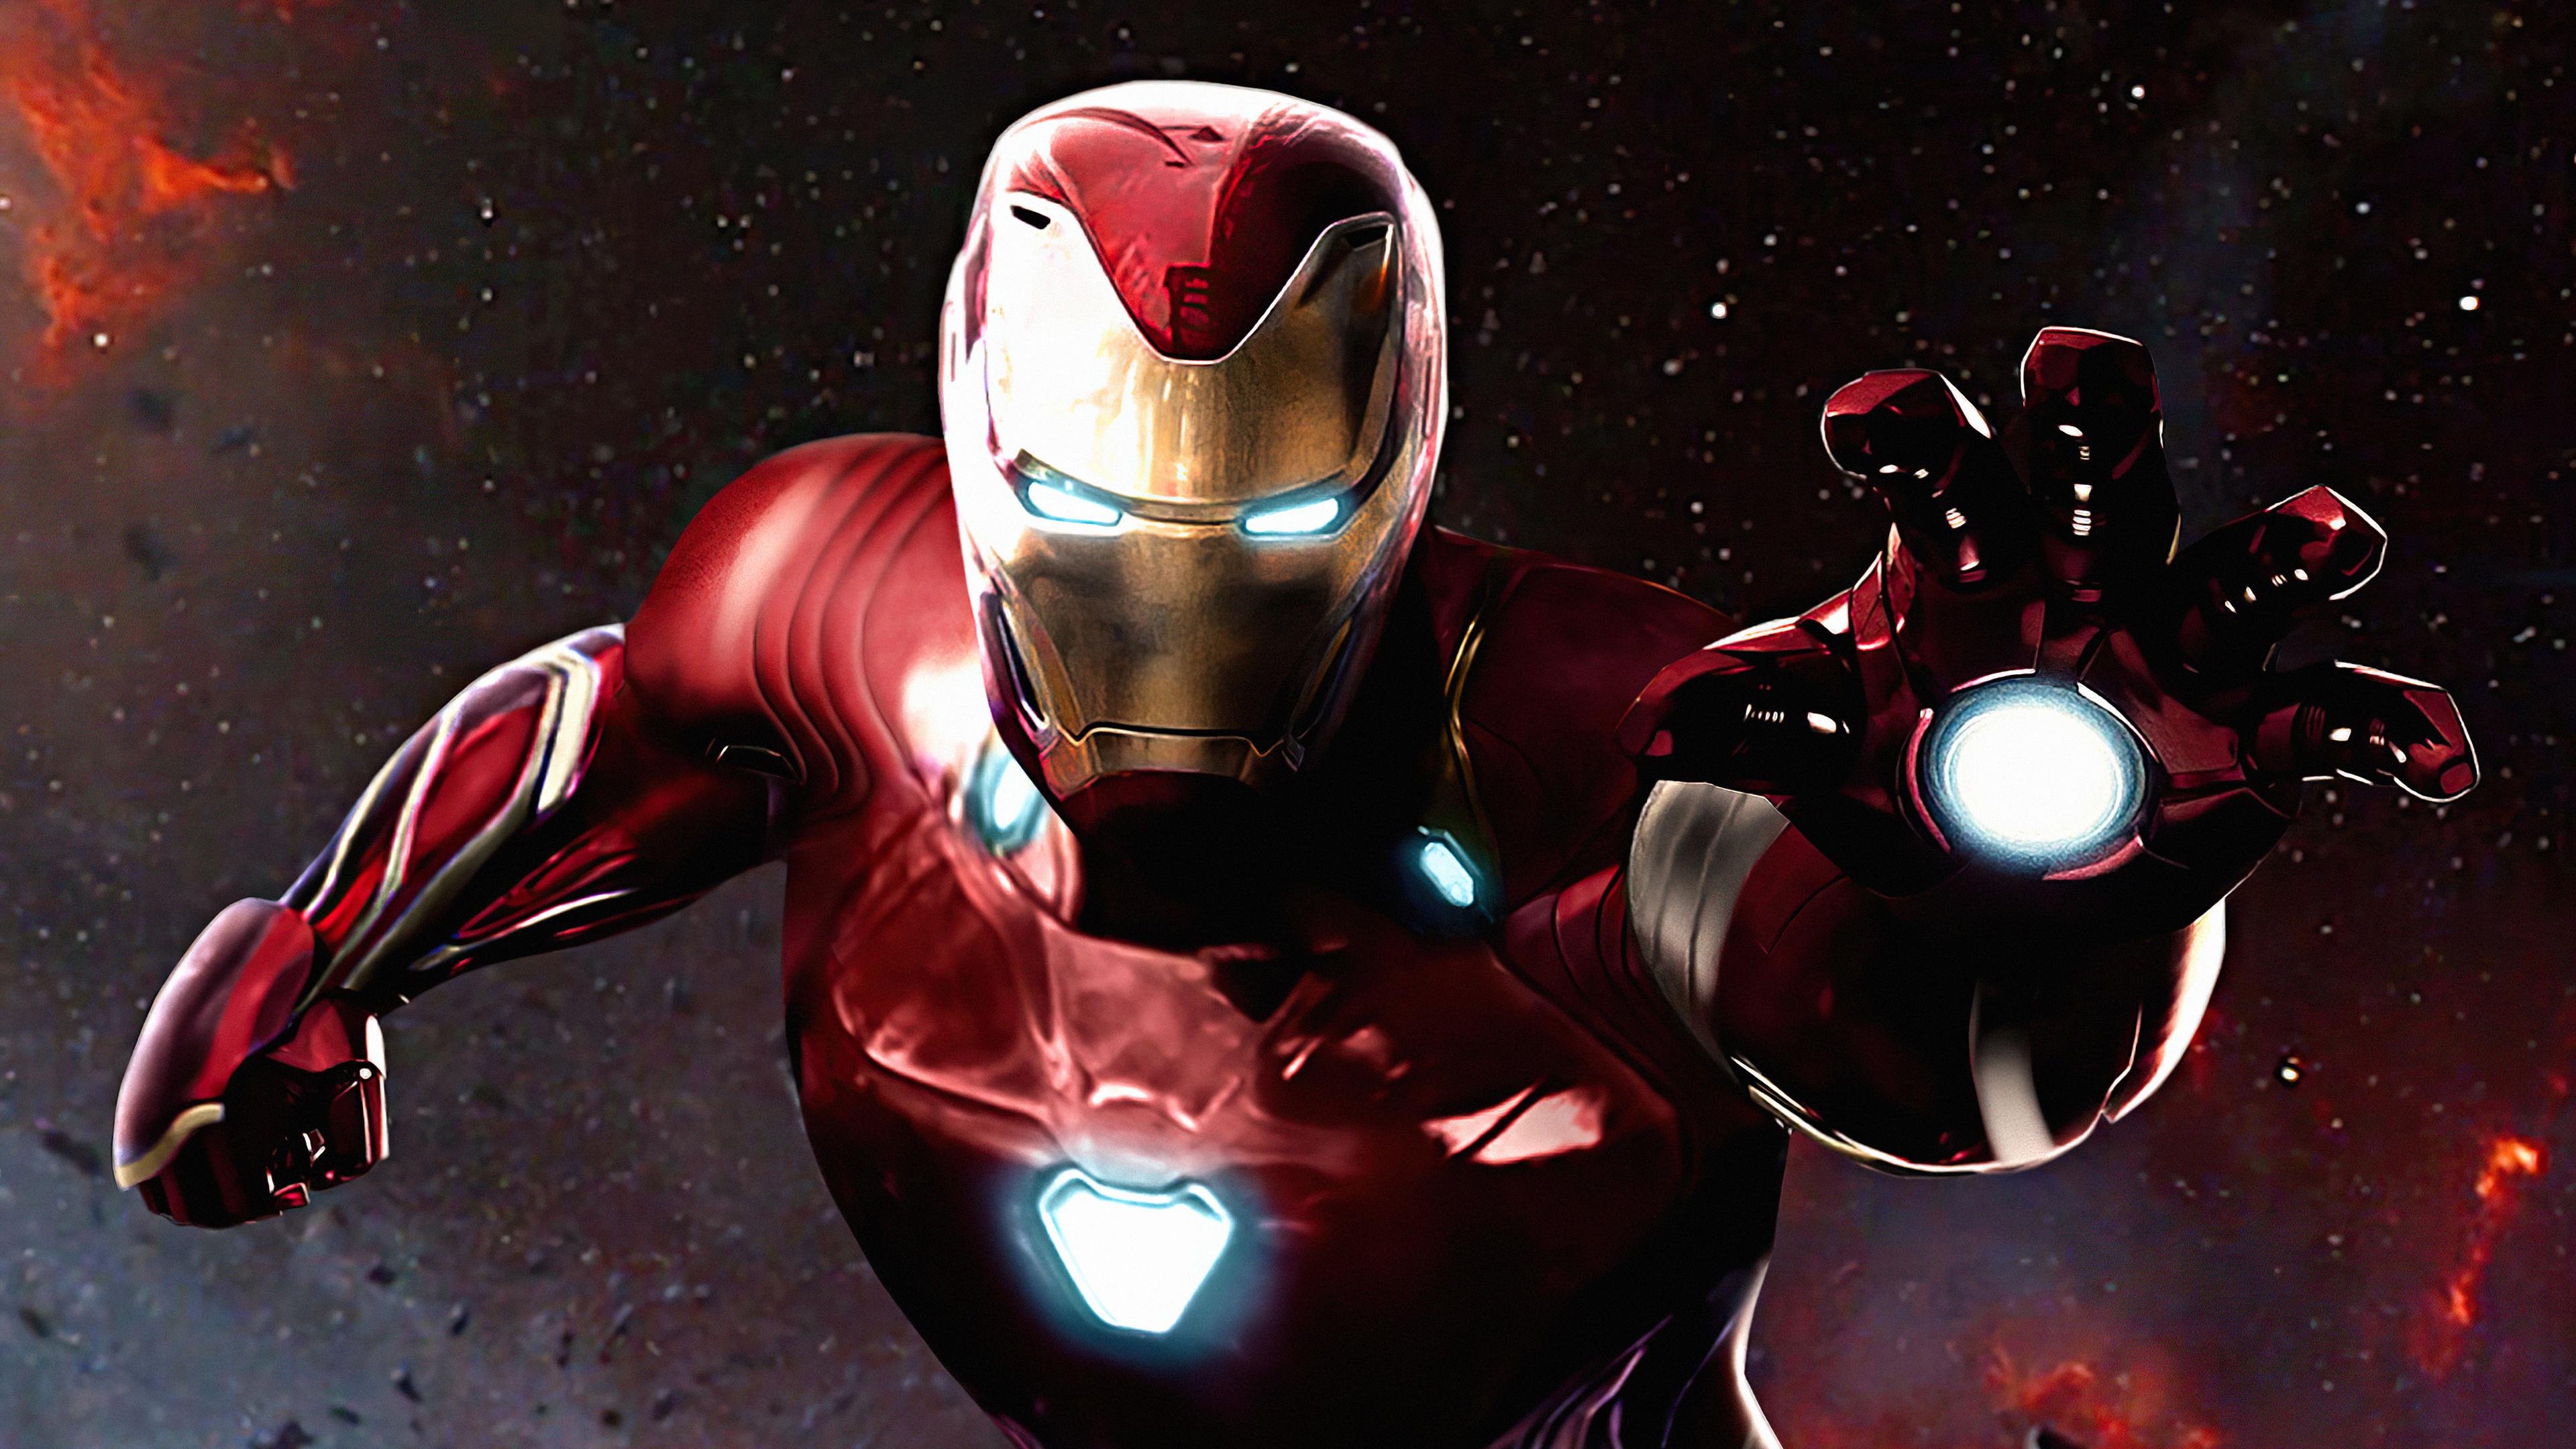 iron man infinitywar 4k 1619215238 - Iron Man InfinityWar 4k - Iron Man InfinityWar 4k wallpapers